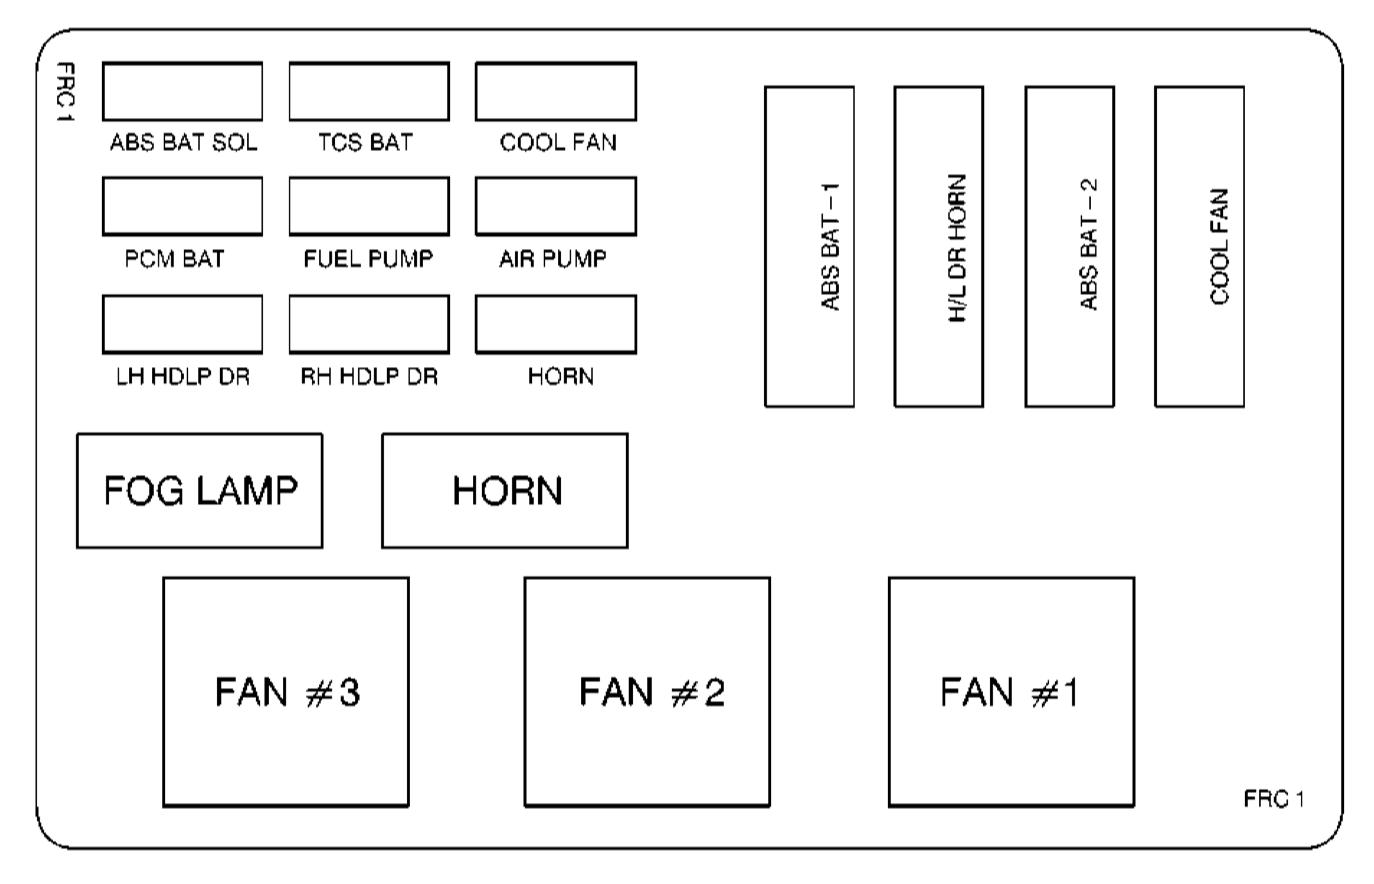 wiring diagram for 2002 chevrolet camaro chevrolet camaro (1999 – 2002) – fuse box diagram ... heating wiring diagram for 2006 chevrolet cobalt ls